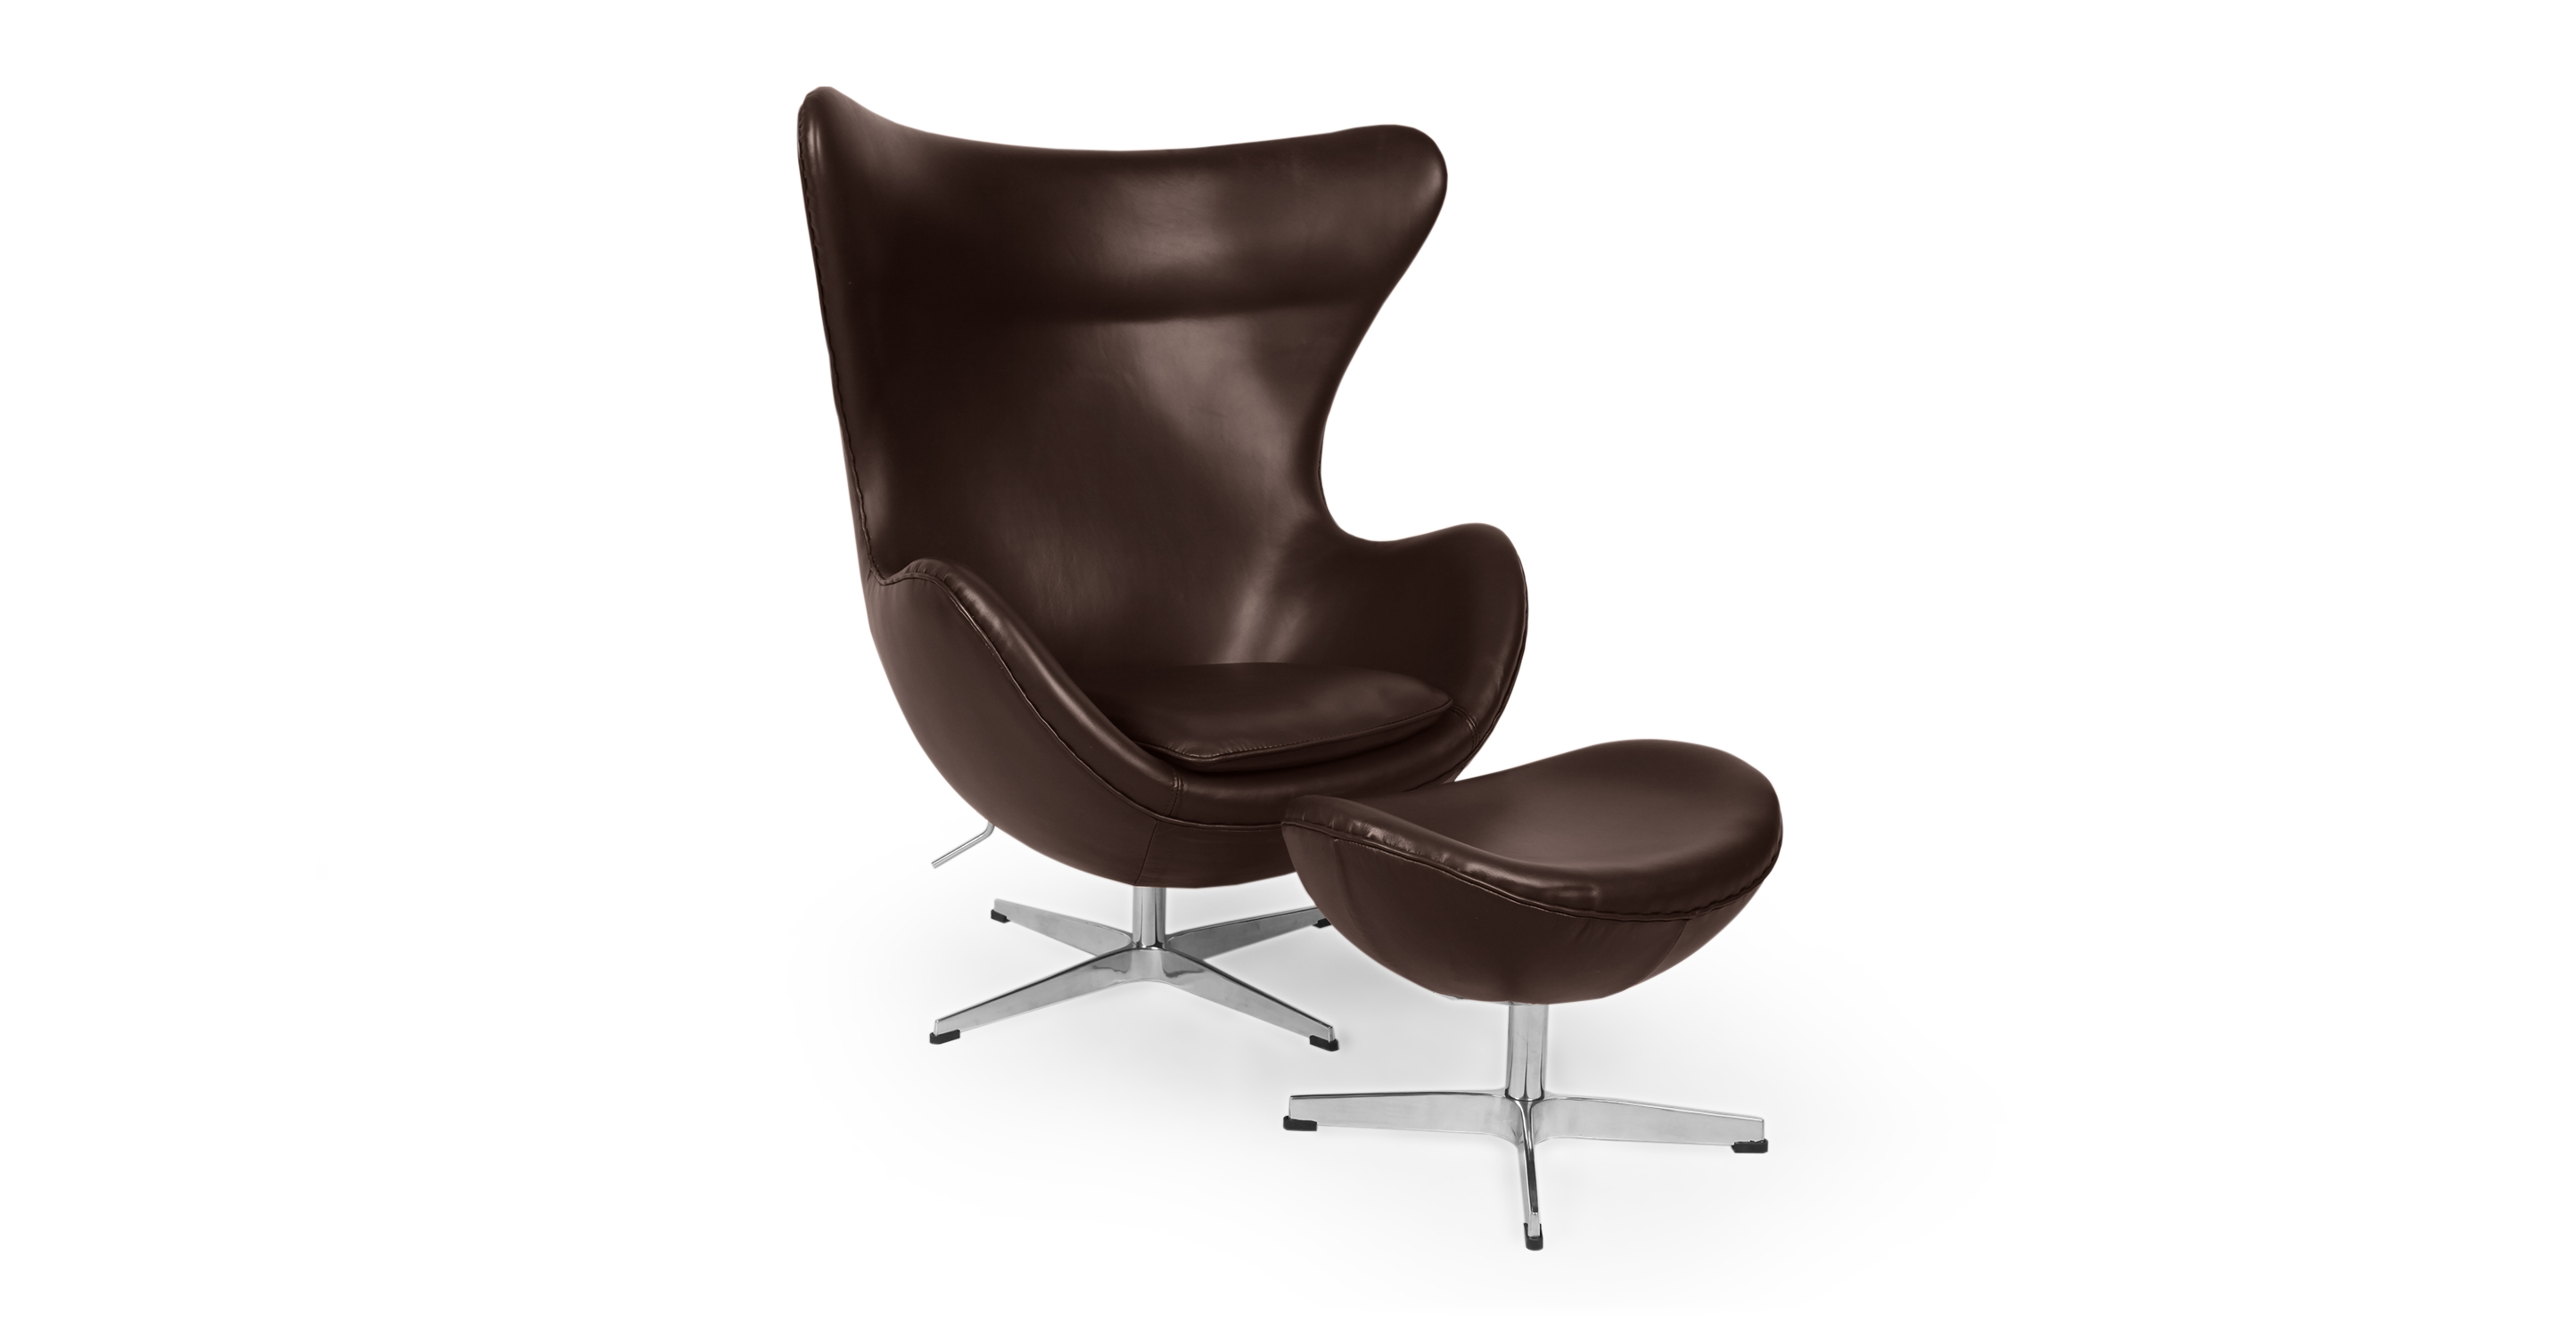 Amoeba Swivel Leather Chair & Ottoman, Choco Brown